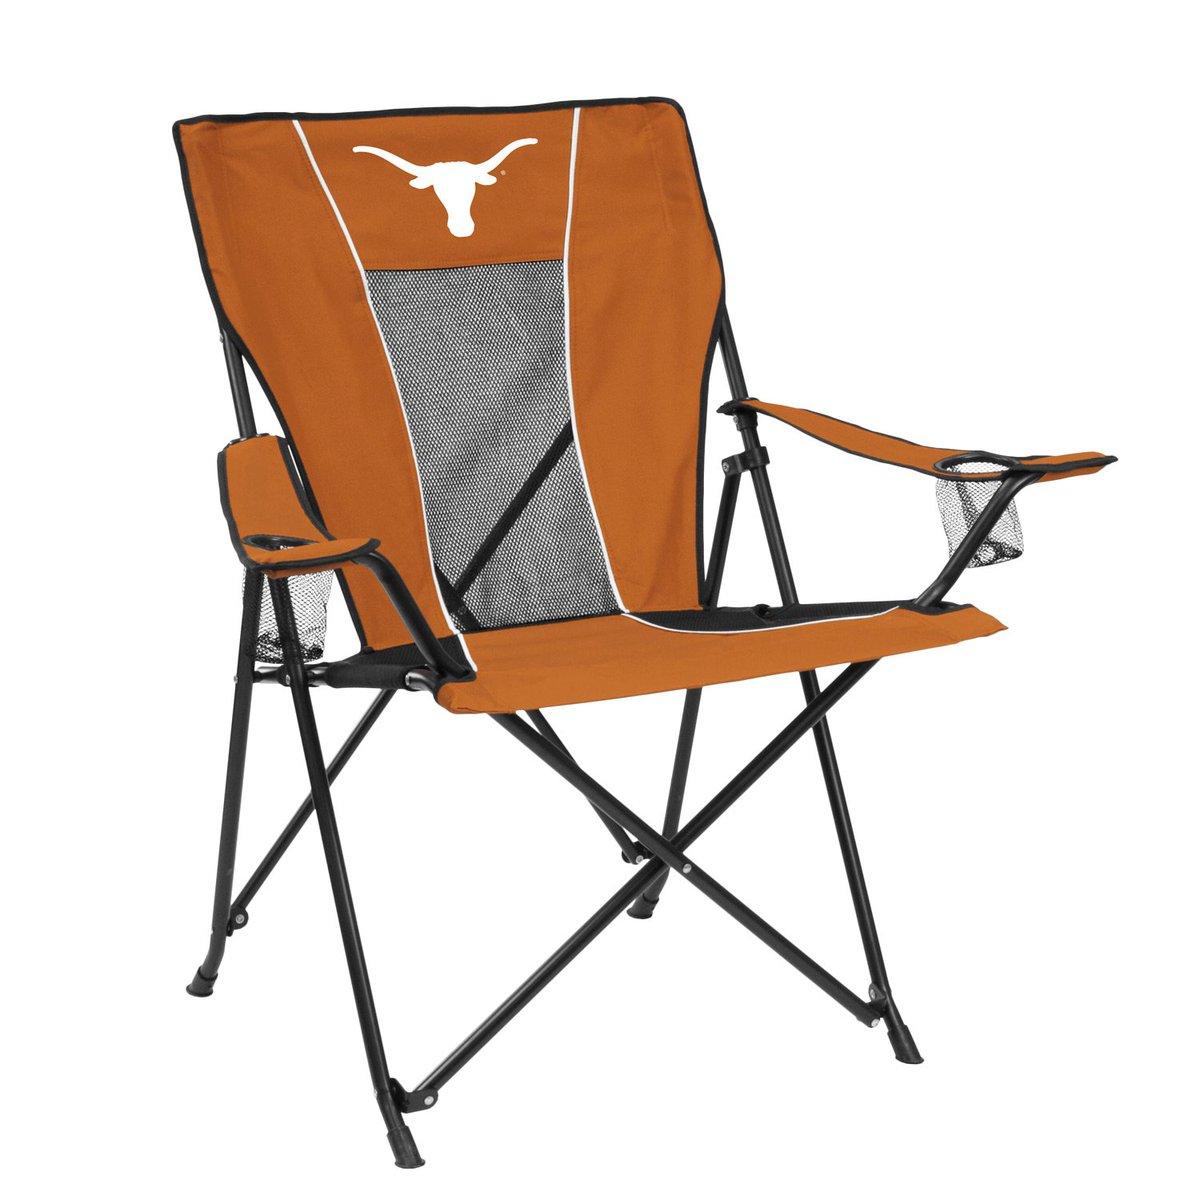 #WednesdayWisdom RT @newtexans: Texas Game Time Chair #WednesdayWisdom https://t.co/jfuMshu8zc https://t.co/UaNDNrHlZX